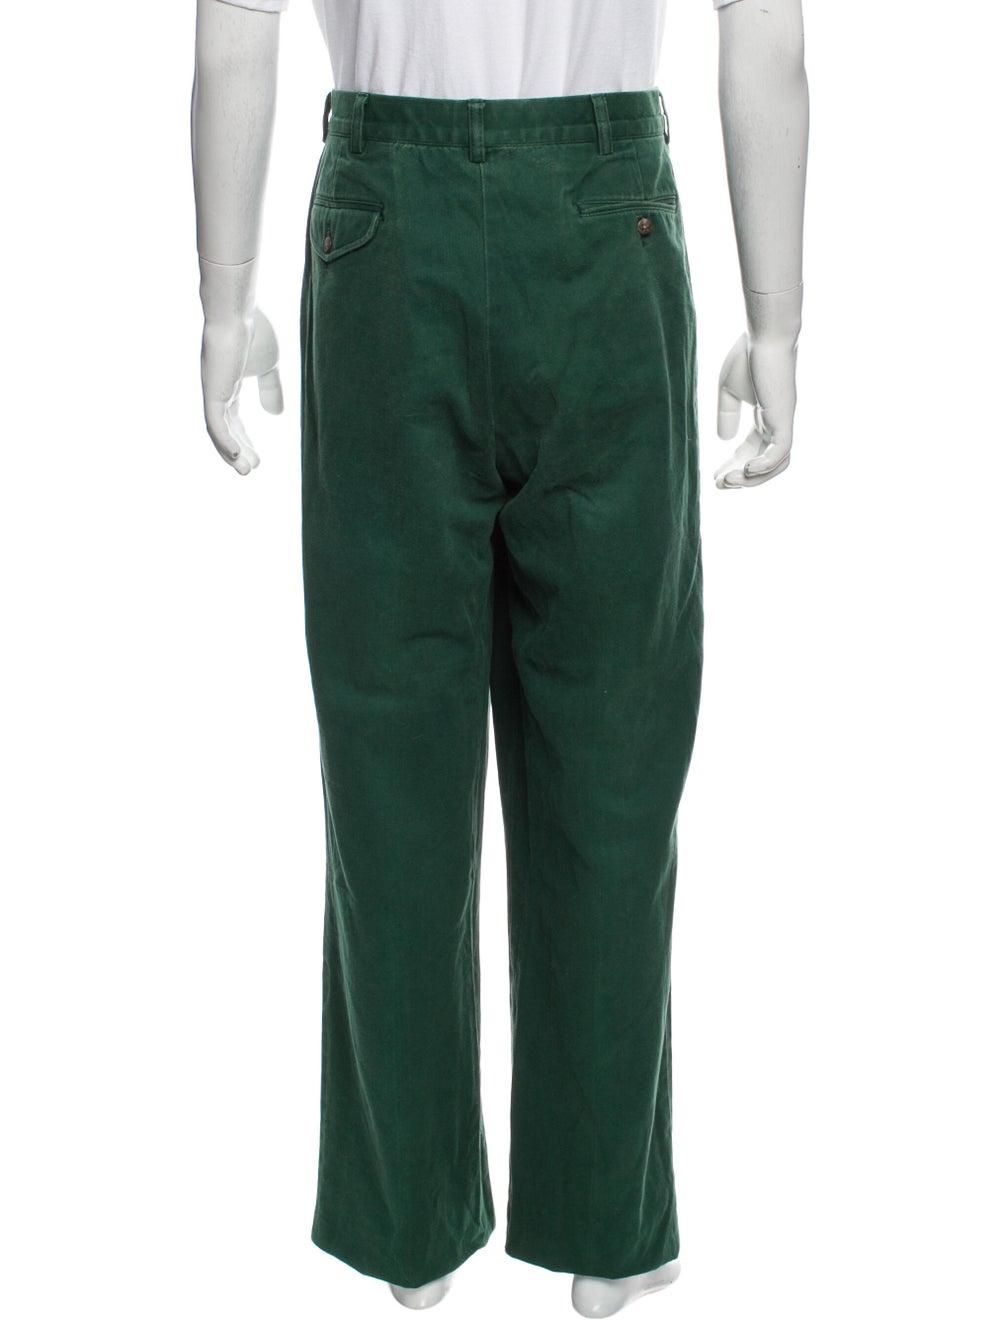 Polo Ralph Lauren Pants Green - image 3